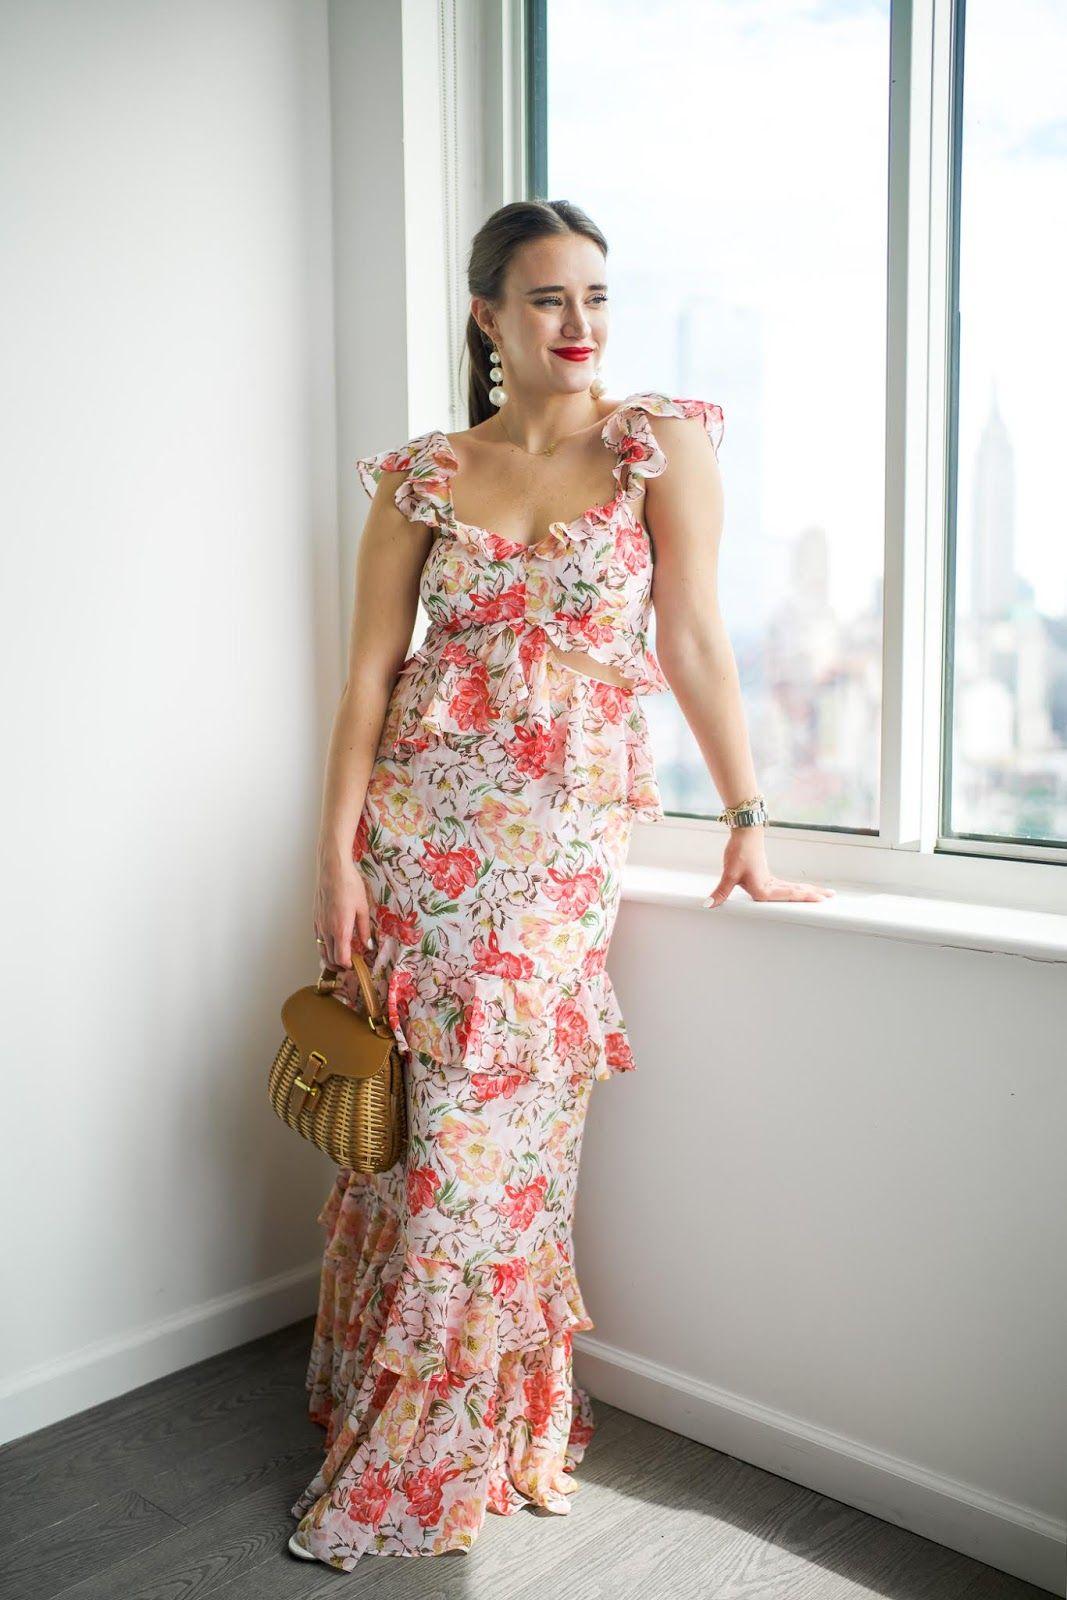 The Perfect Wedding Guest Dress Dresses Maxi Dress Wedding Guest Outfit [ 1600 x 1067 Pixel ]